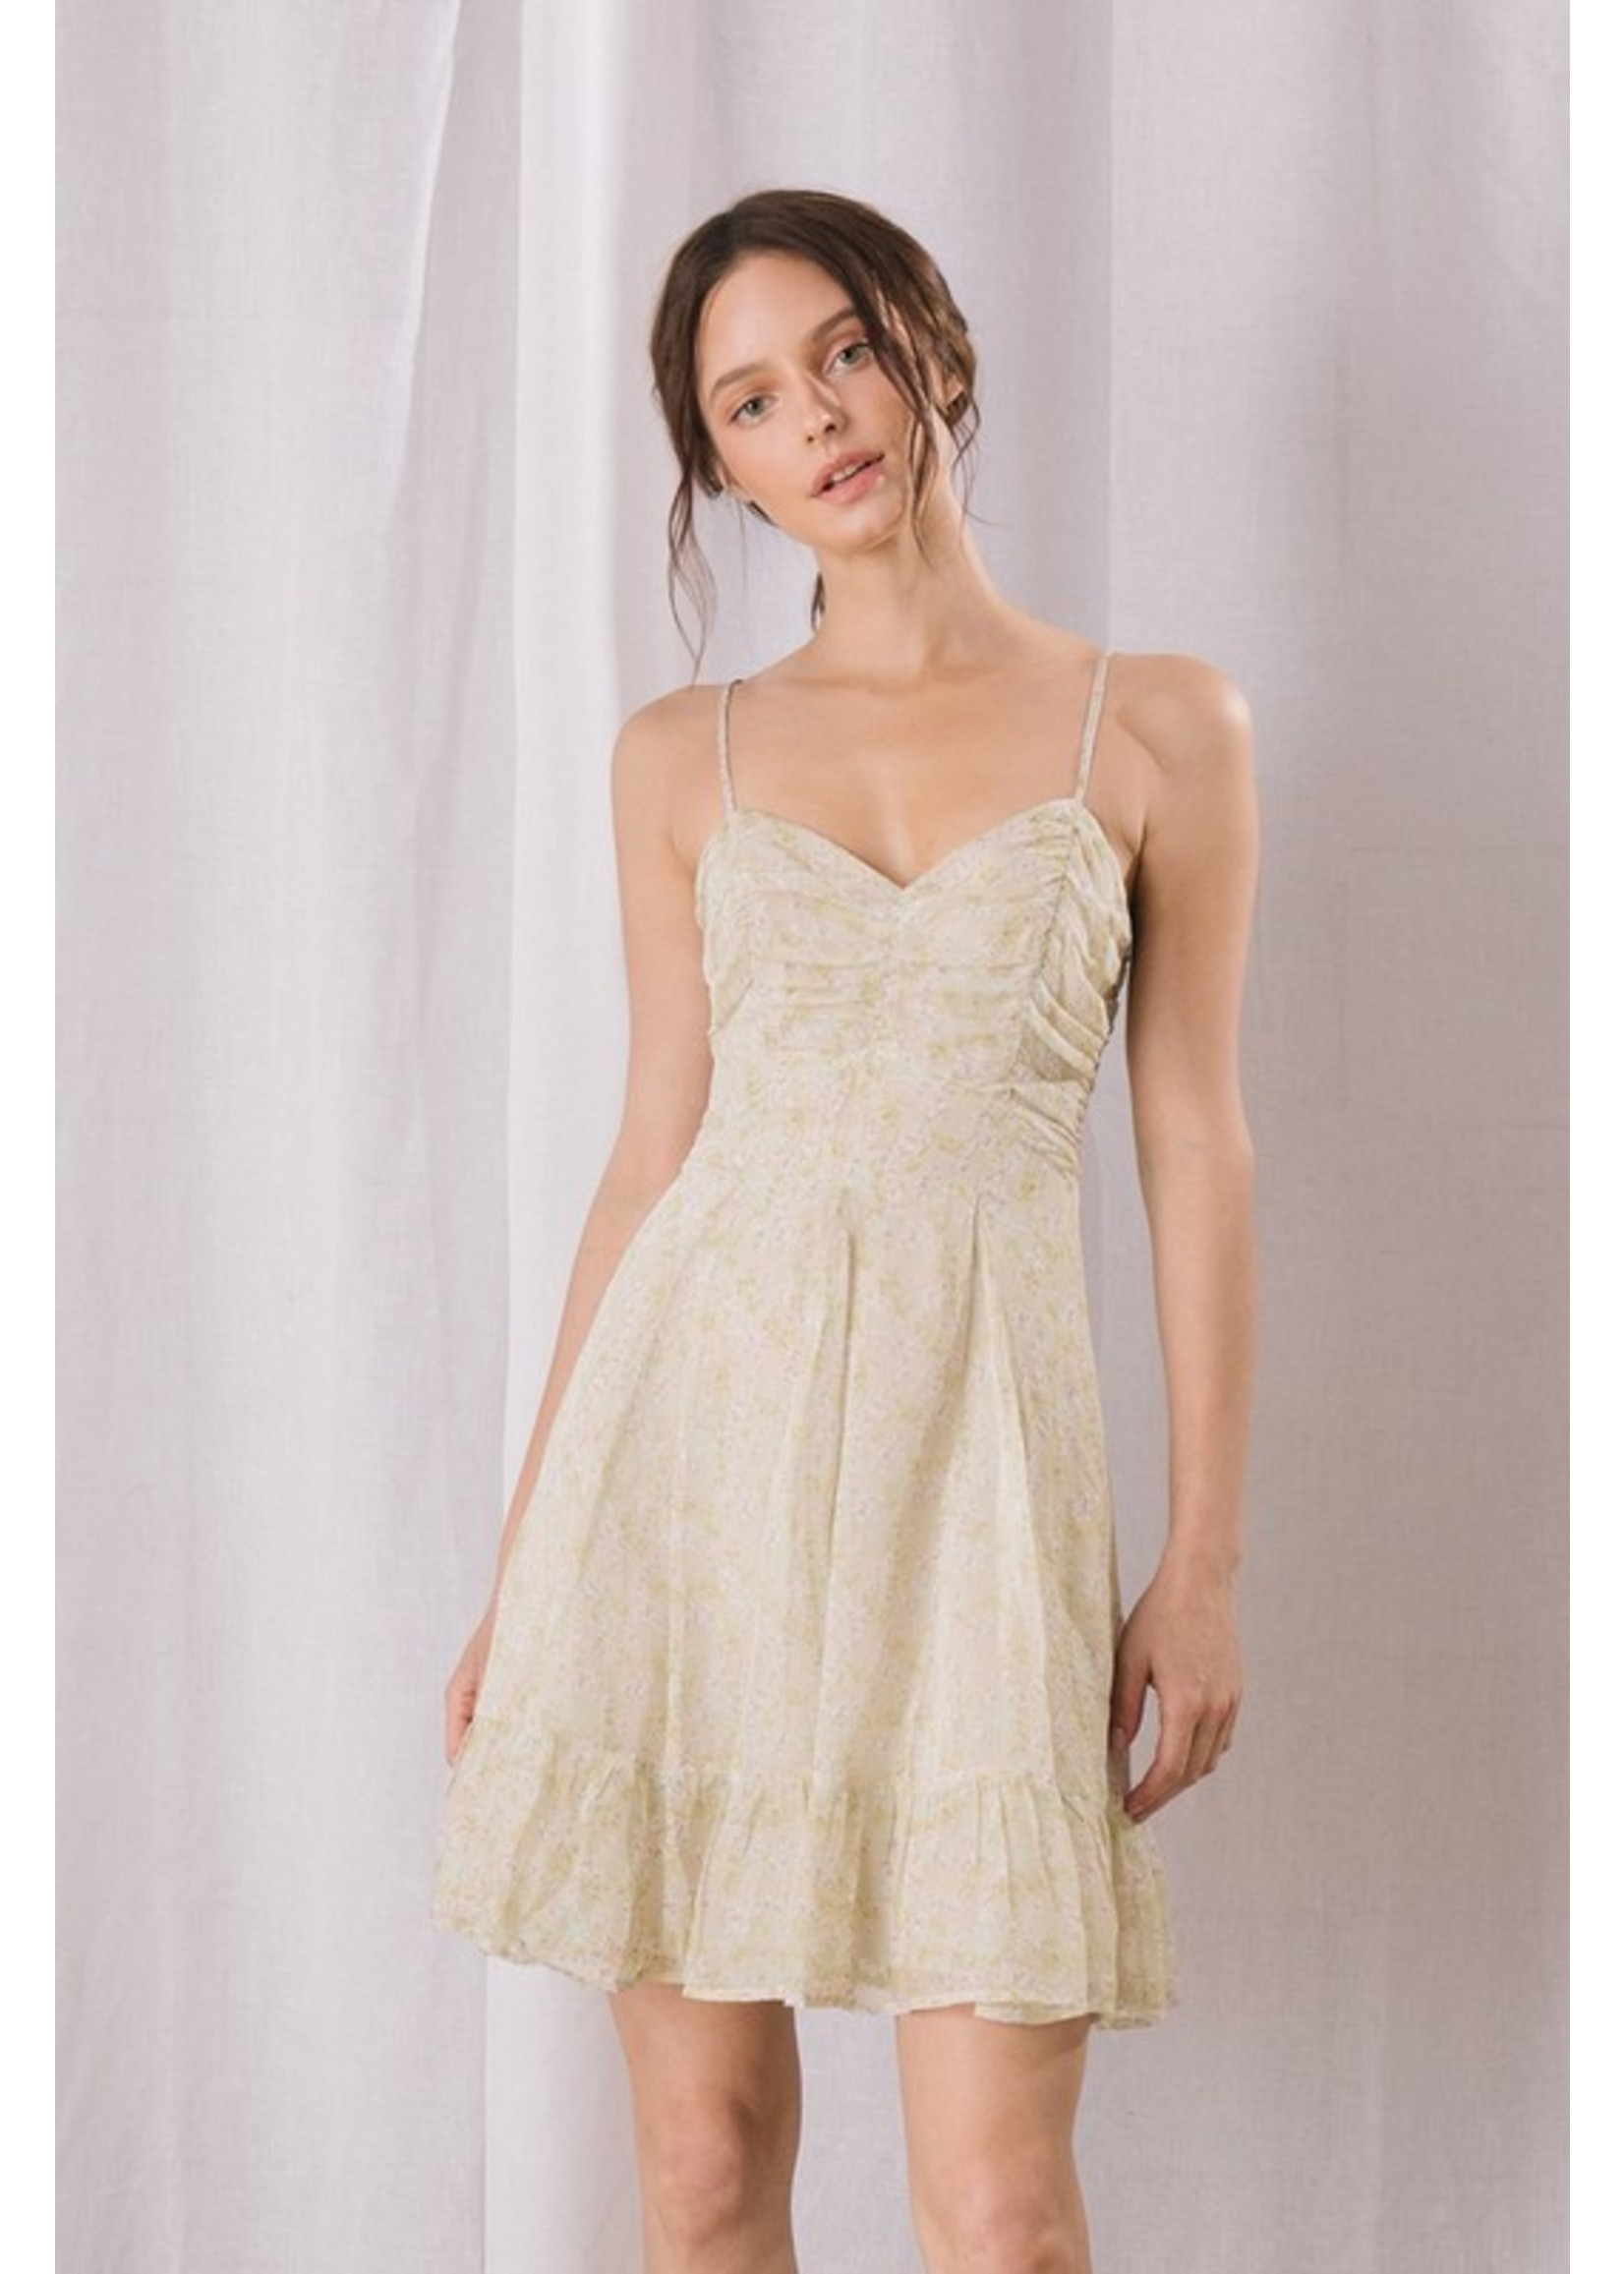 Storia Floral Ruched Mini Dress - BD2098